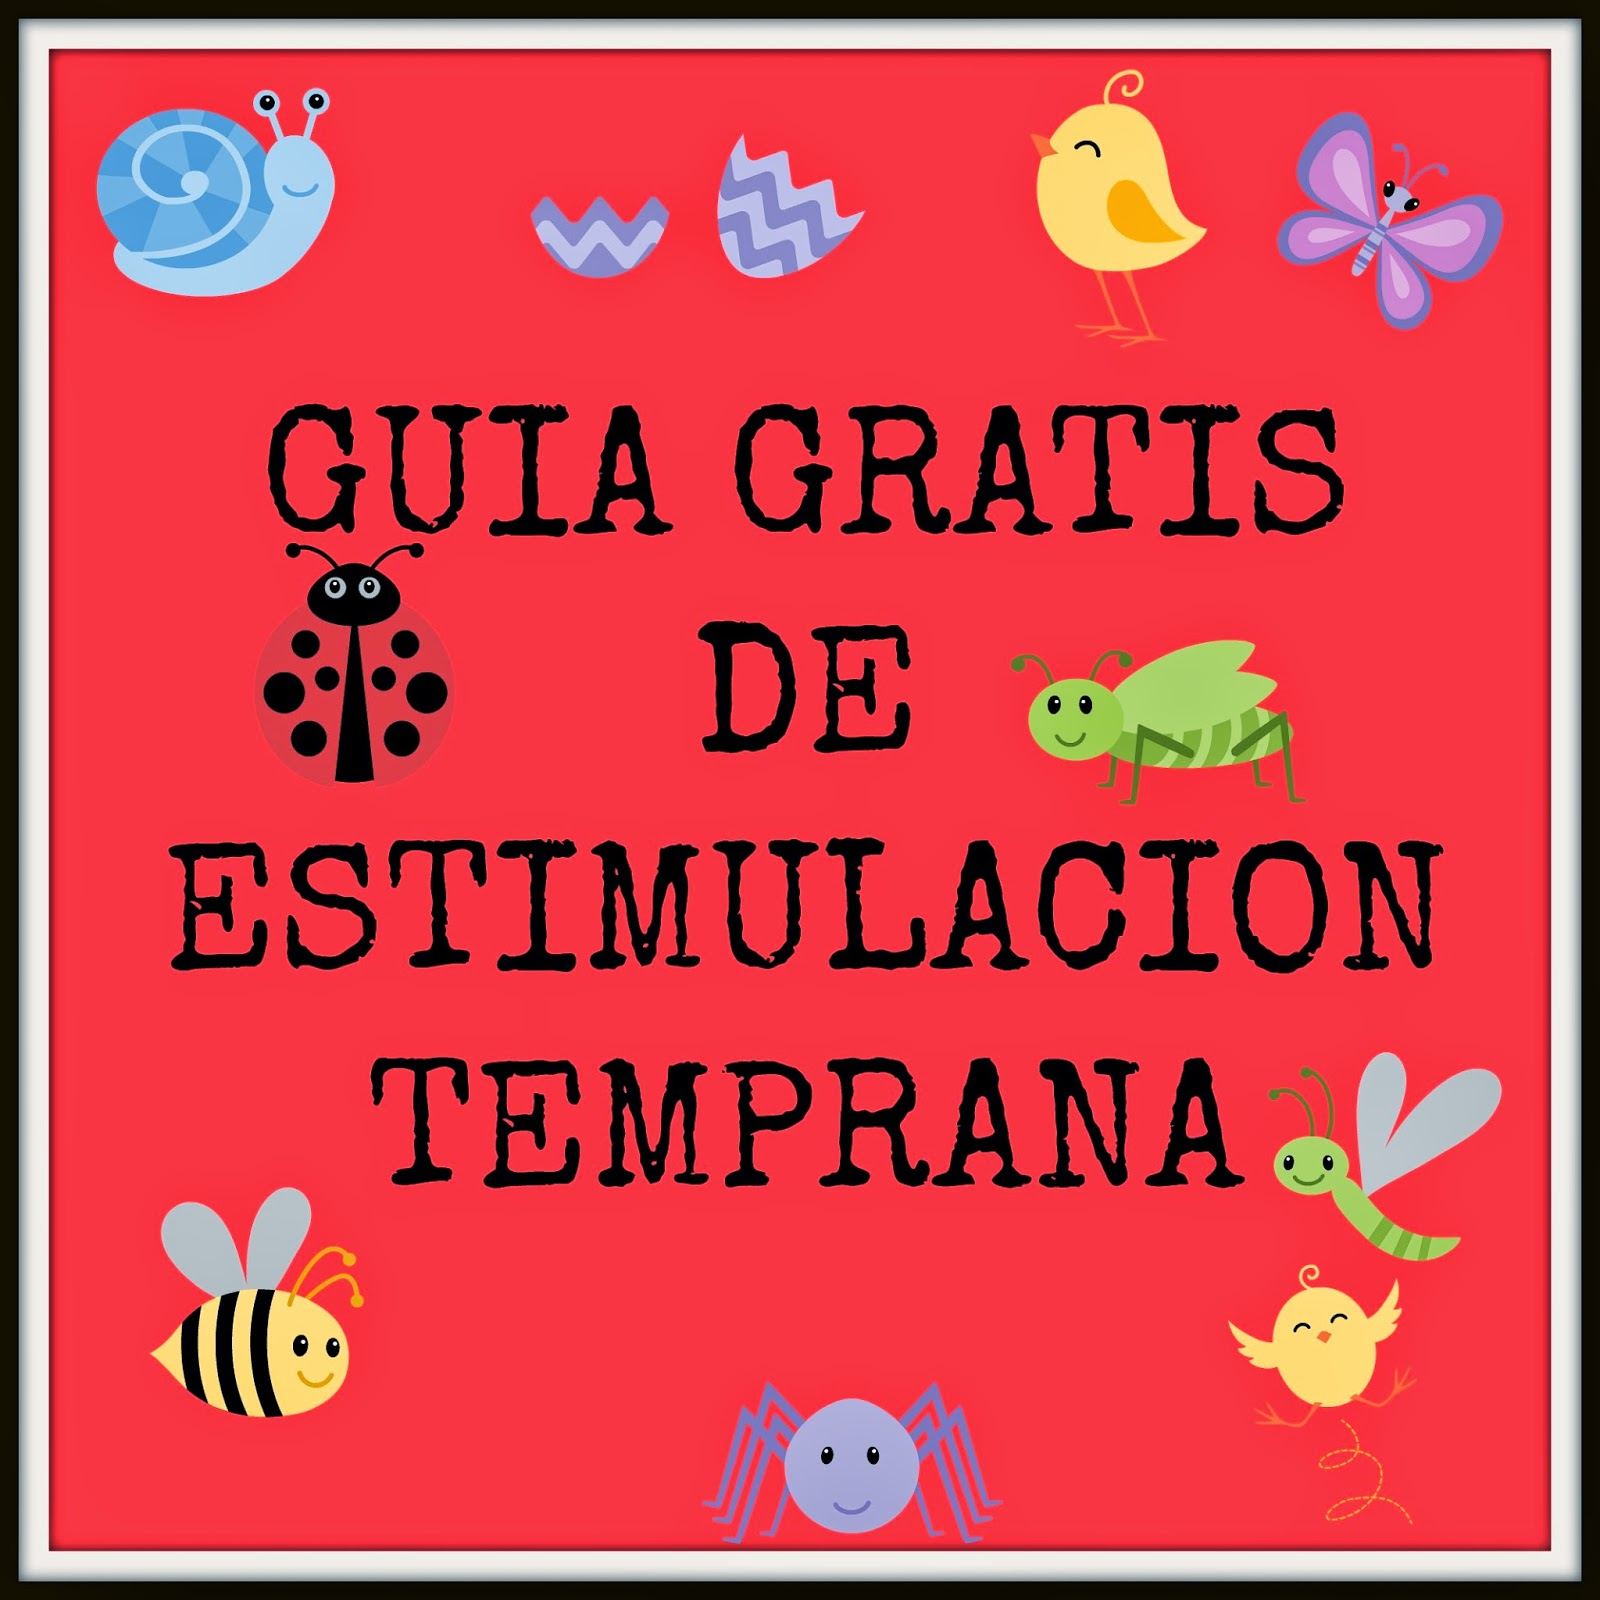 GUIA GRATIS DE ESTIMULACION TEMPRANA